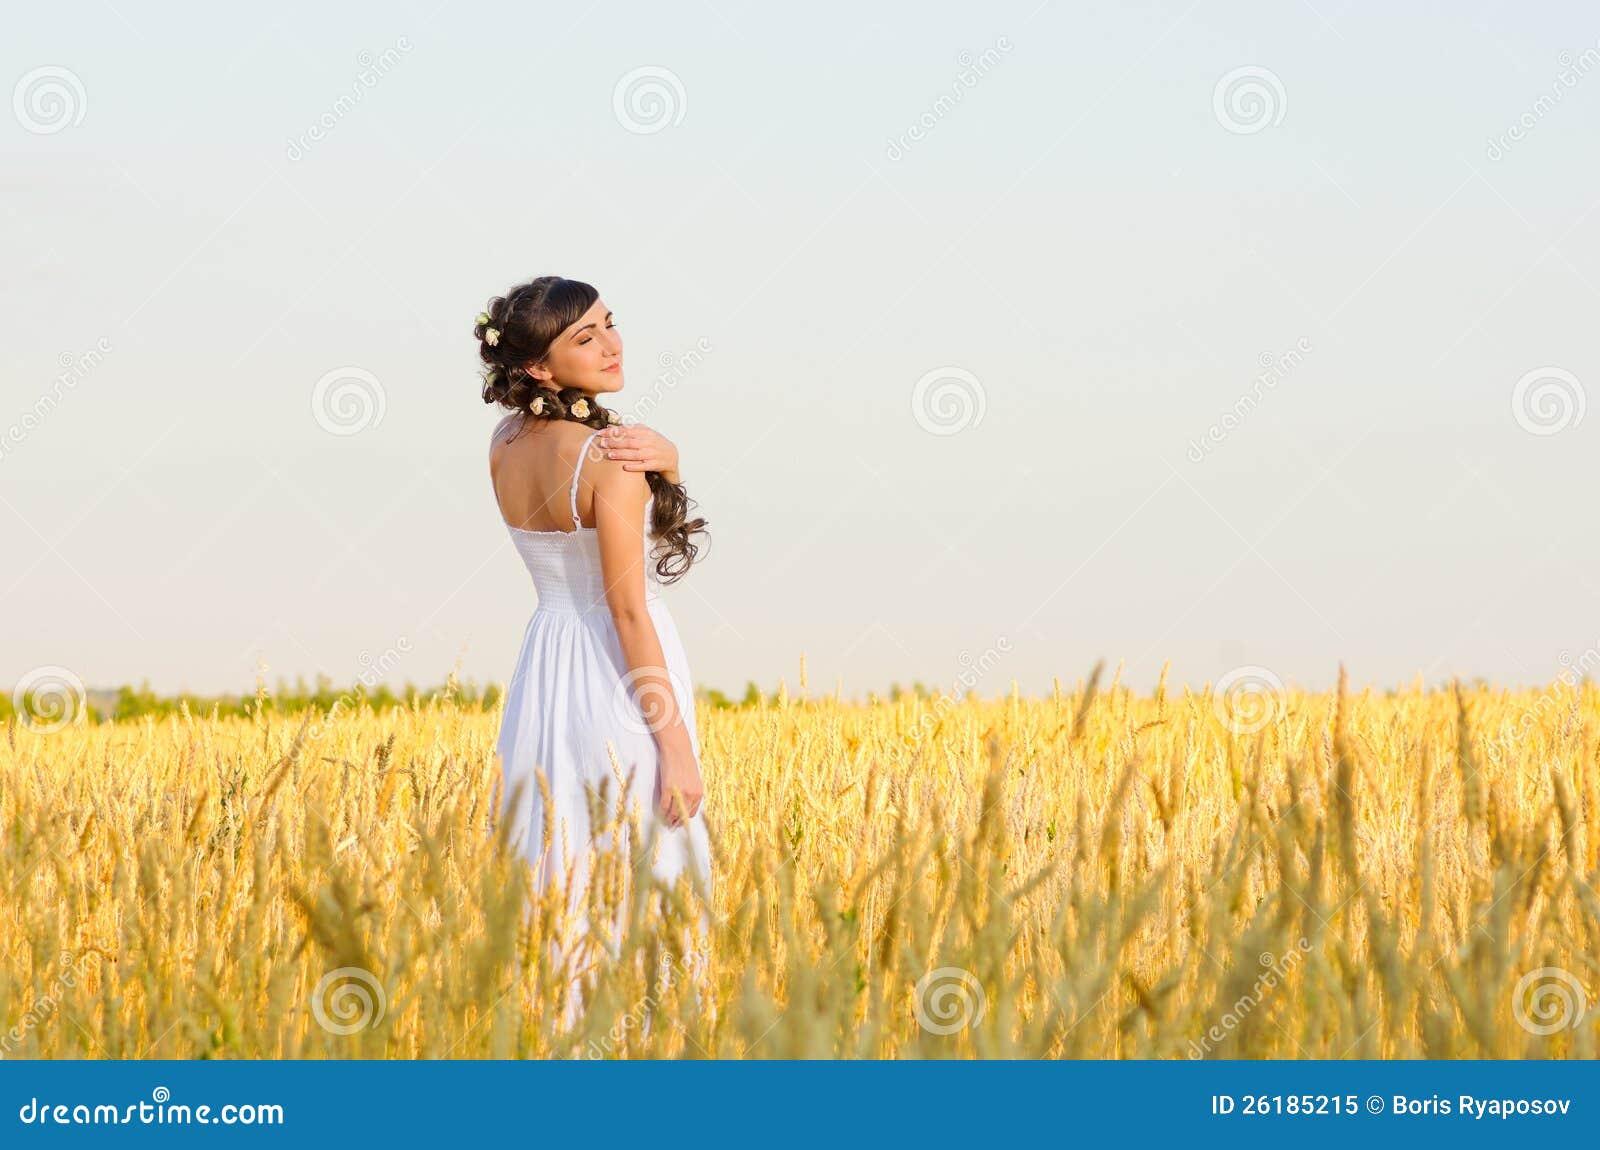 Woman On Wheat Field Royalty Free Stock Photo - Image ...